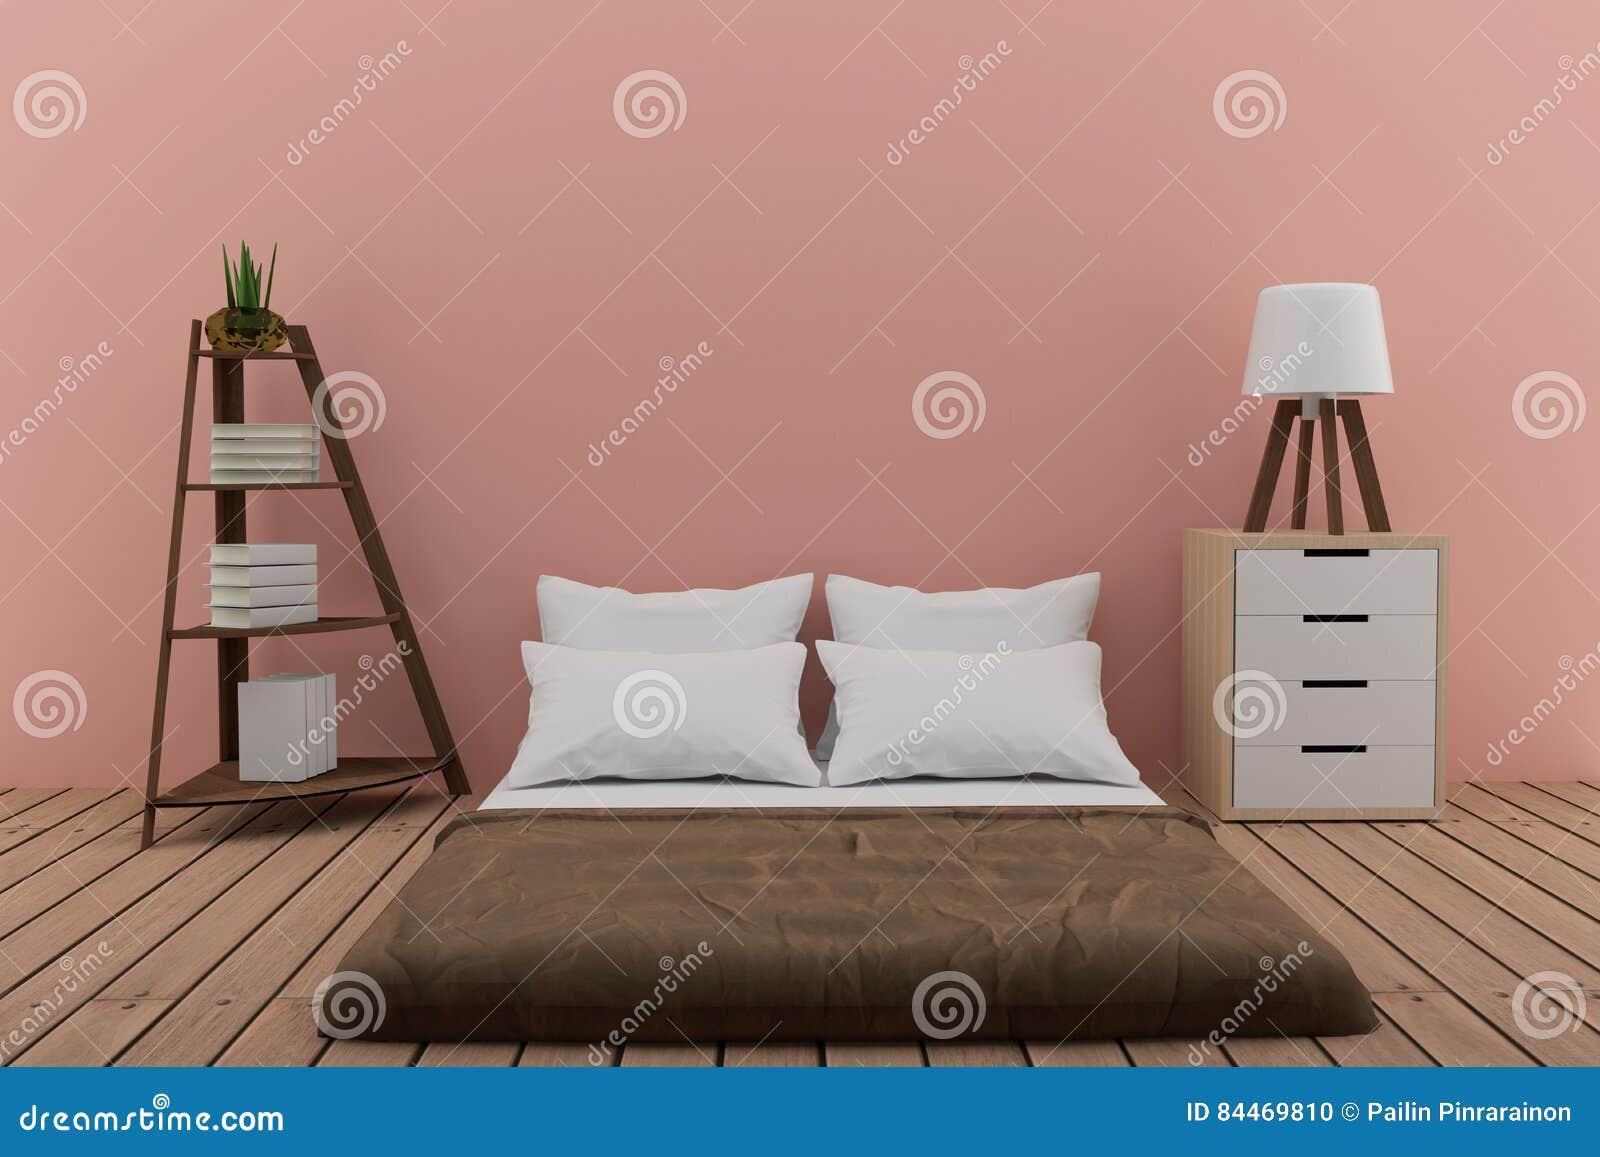 Slaapkamer Lamp Roze : Slaapkamer met boekenrek met kleine lamp en kabinet in roze ruimte